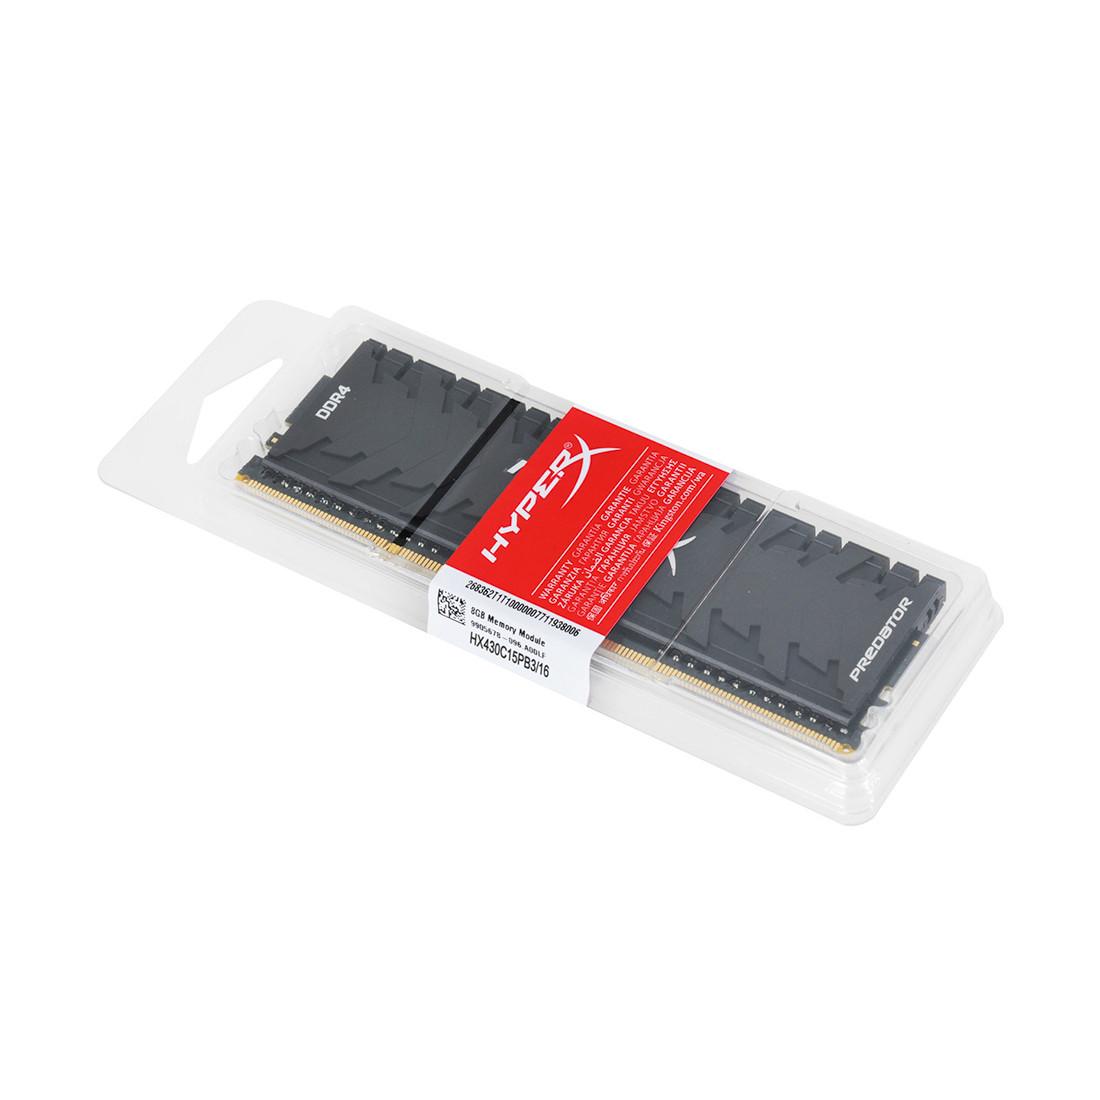 Kingston HX430C15PB3/16 HyperX Predator Модуль памяти DDR4, 16GB, DIMM